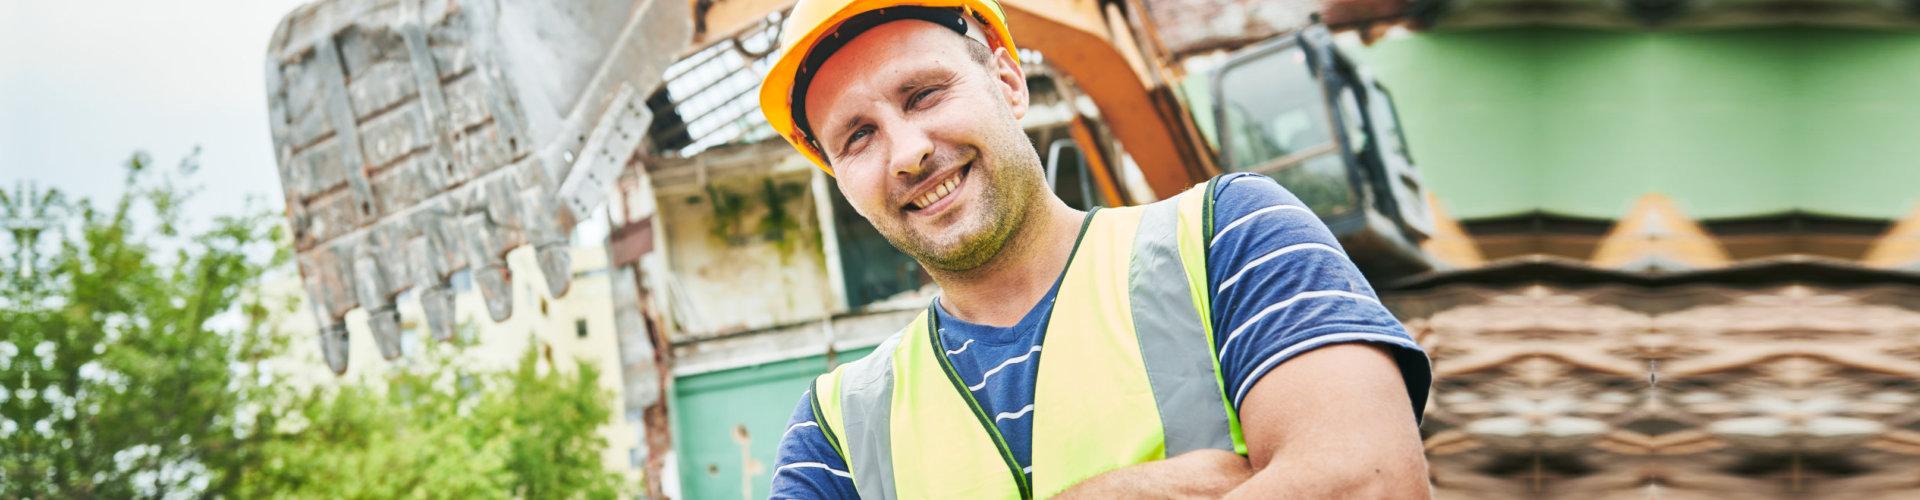 demolition man smiling